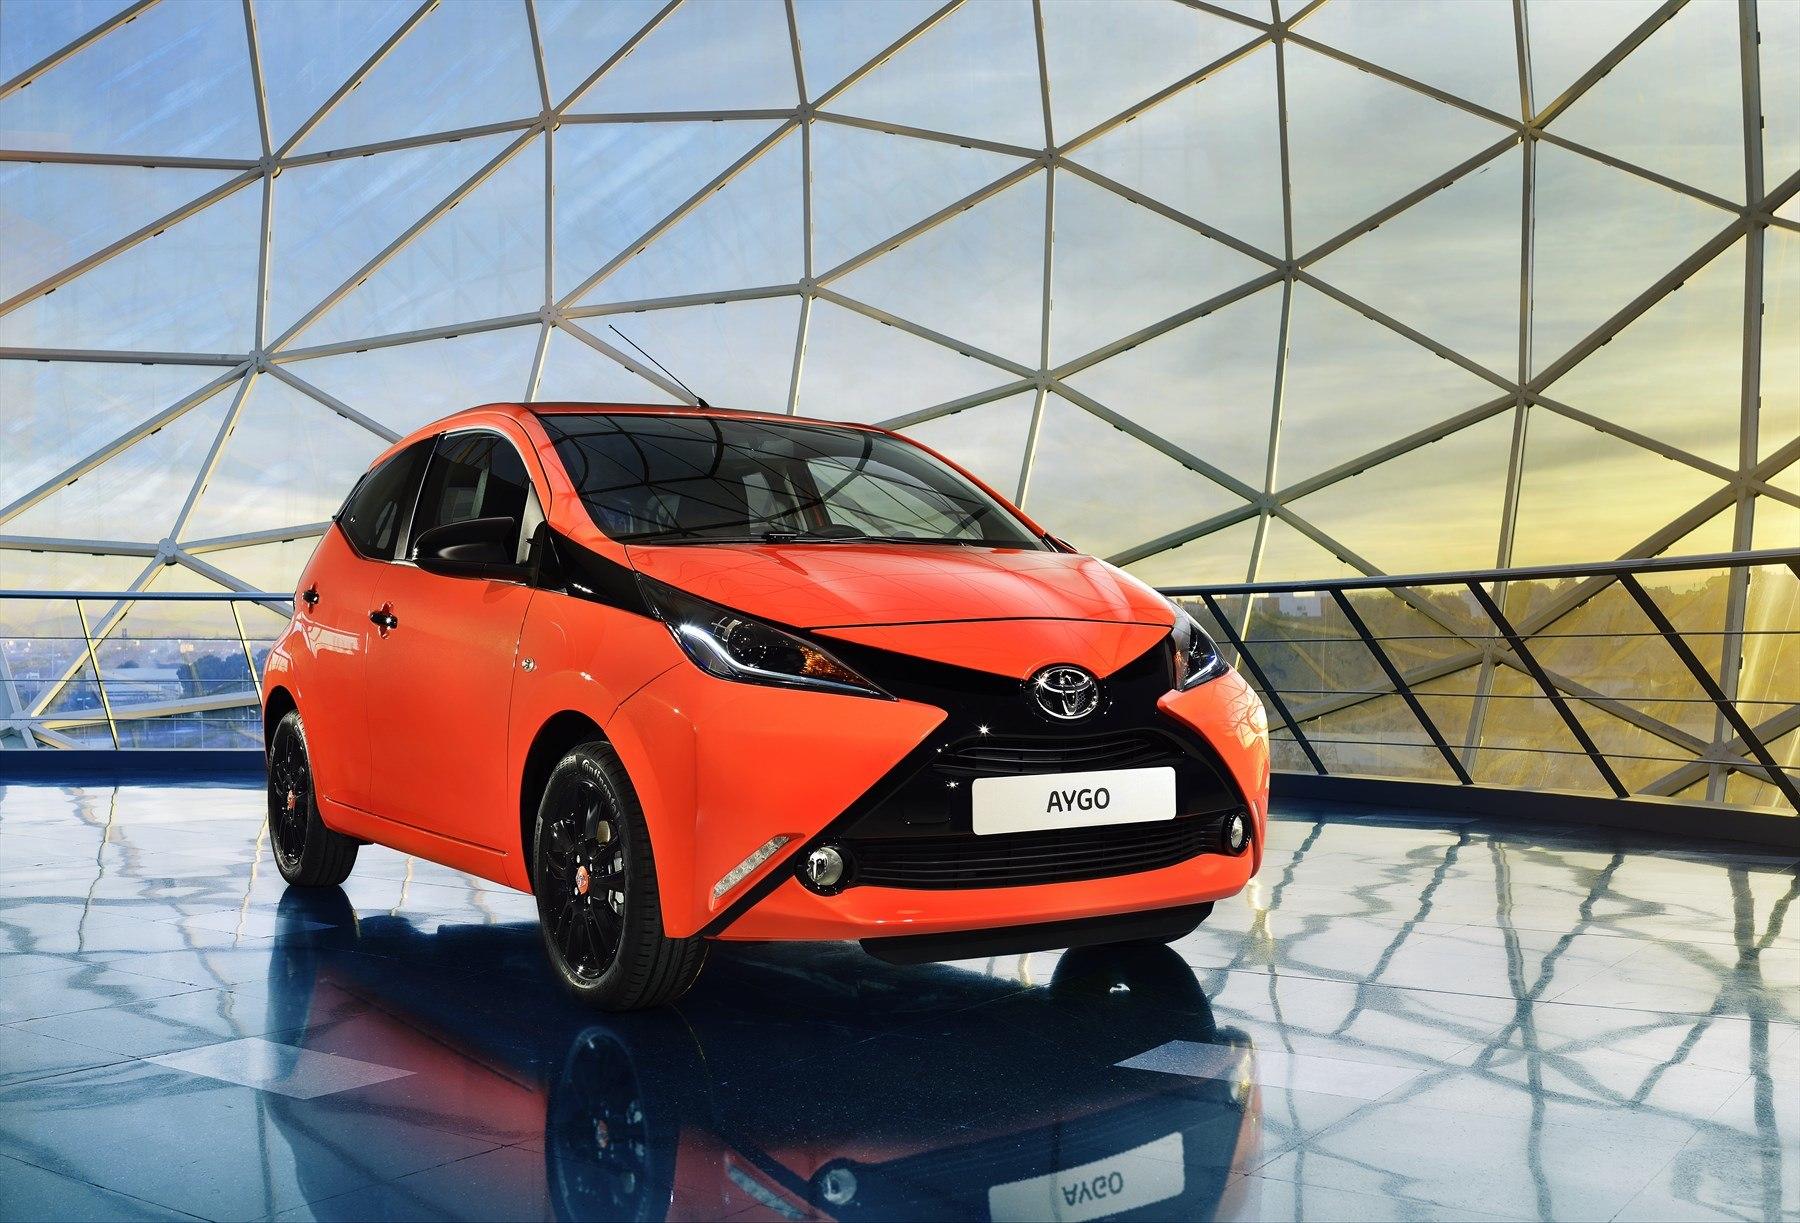 Toyota Develops Home Control Technology: Latest News